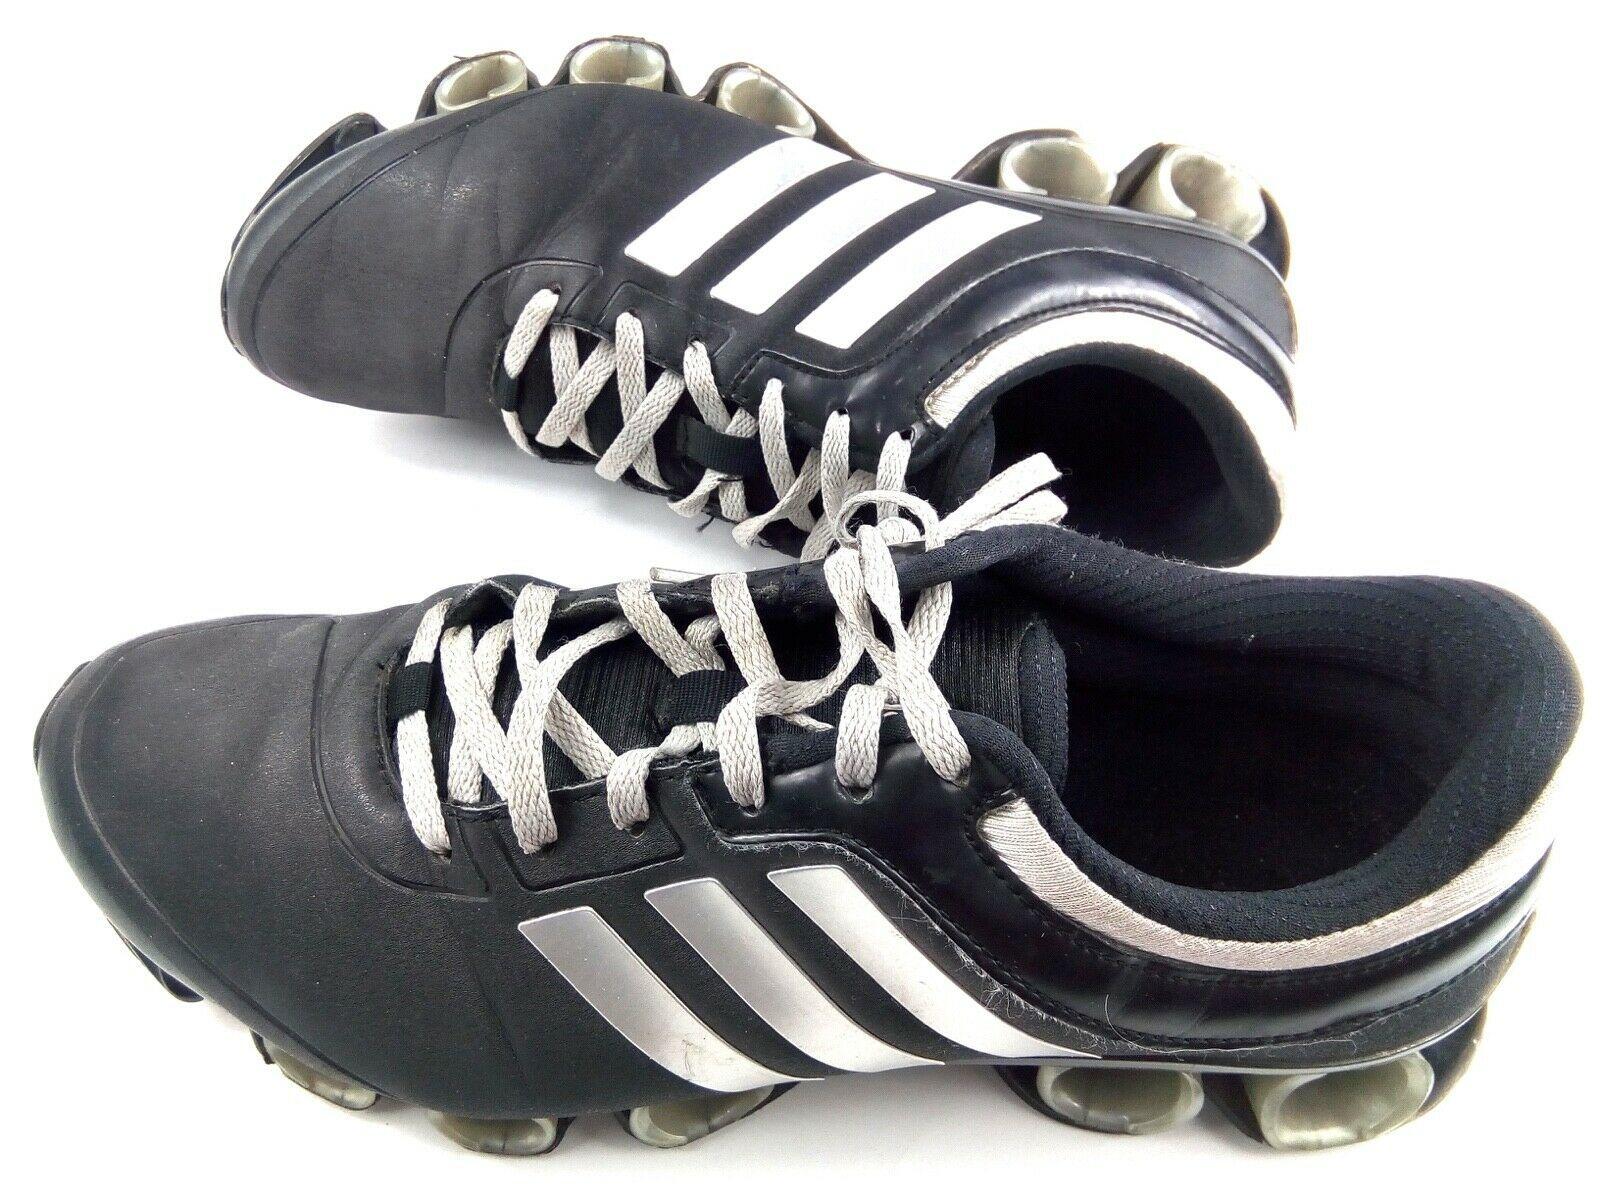 Adidas TITAN BOUNCE Men's Sneaker megabounce workout springblade 9 Shoes $180